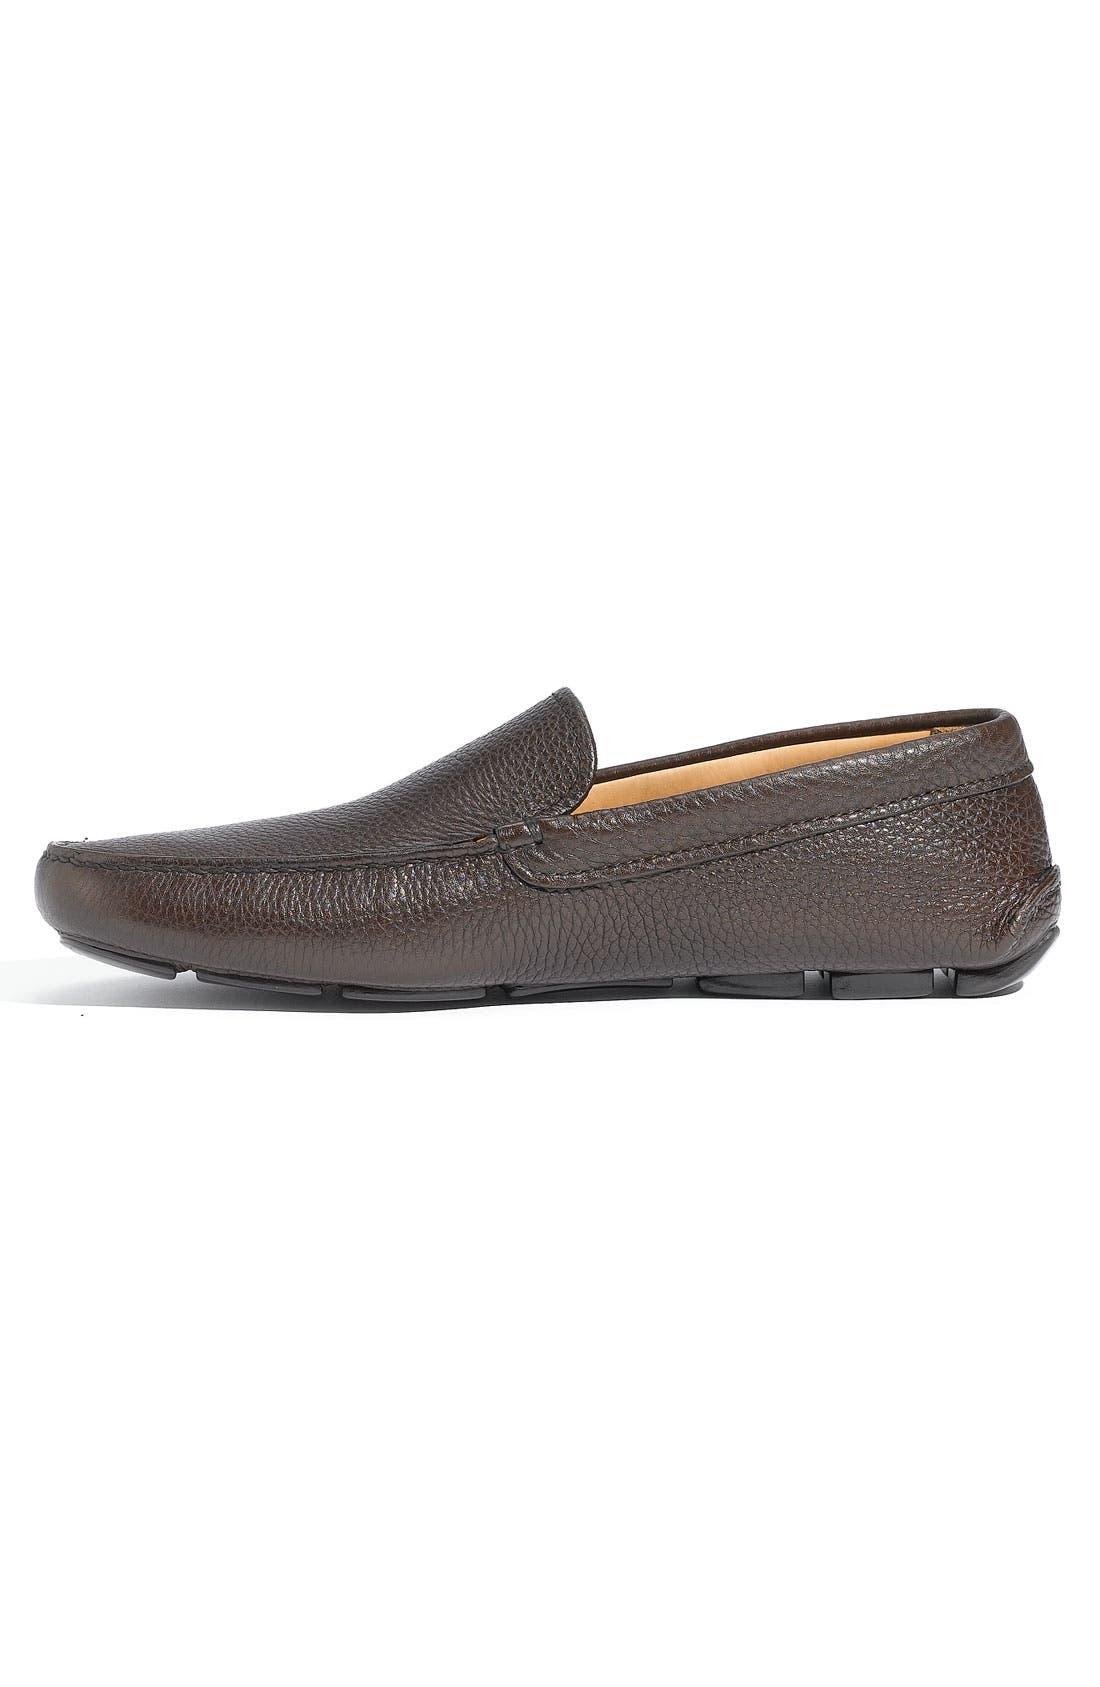 Alternate Image 2  - Prada Pebbled Leather Driving Shoe (Men)